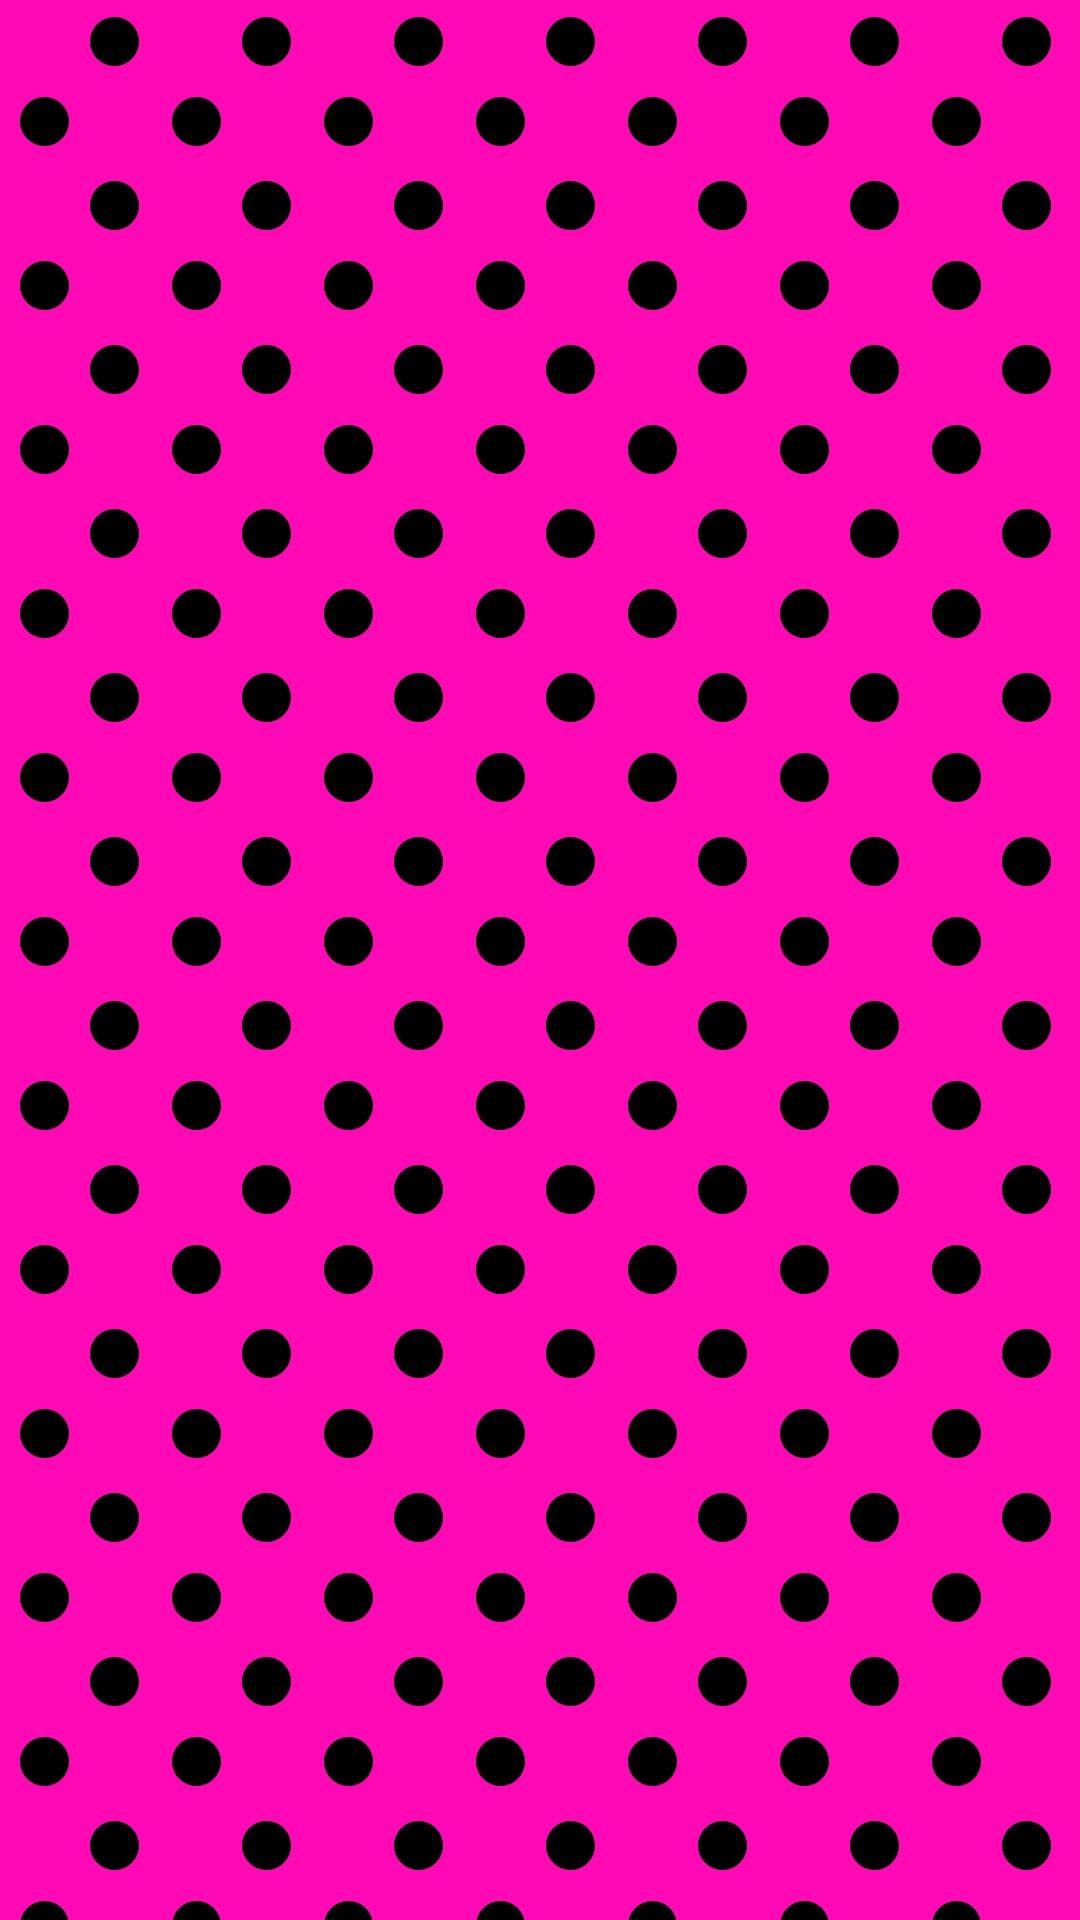 Polkadot Pink Iphone Wallpaper Iphonewallpapers Pinterest